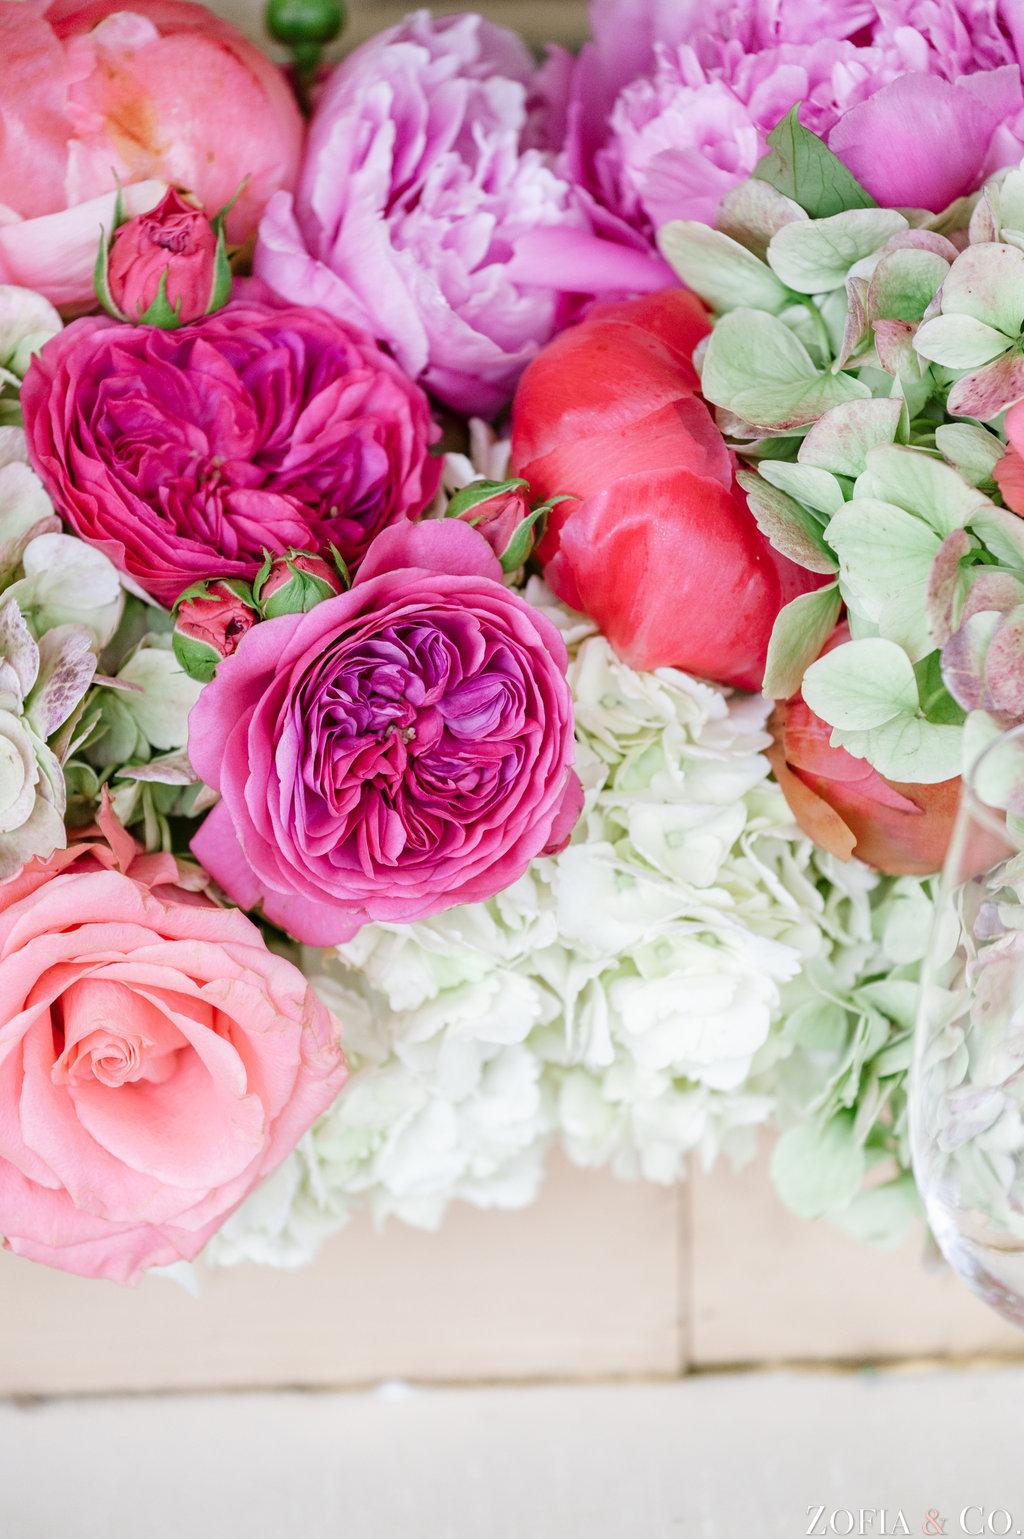 Ceci_New_York_Style_Luxury_Custom_Summer_Wedding_CeciBride_Nautical_Blue_Gold_Letterpress_Foil_225.jpg